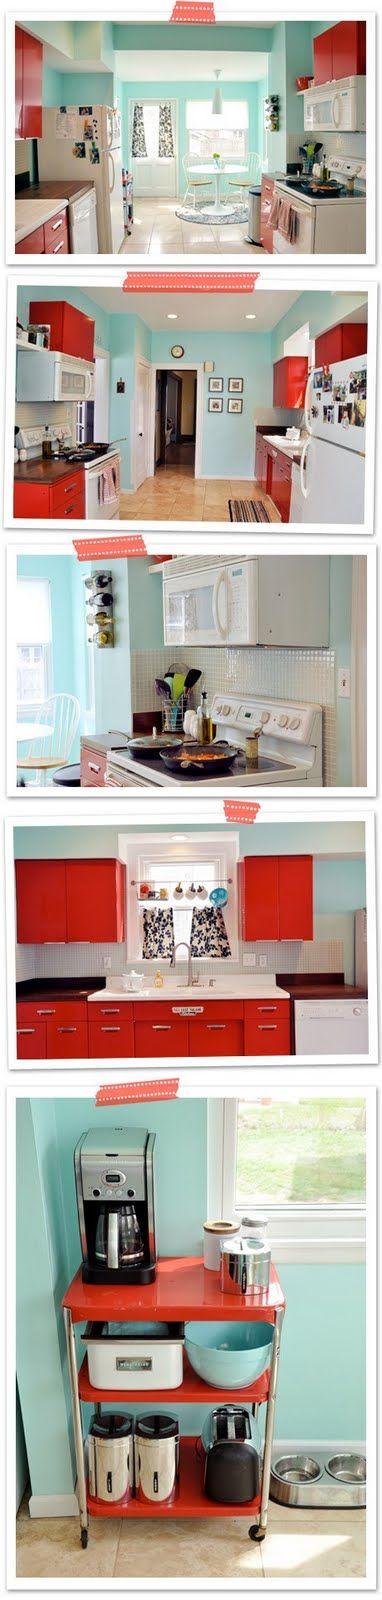 Perfect retro kitchen